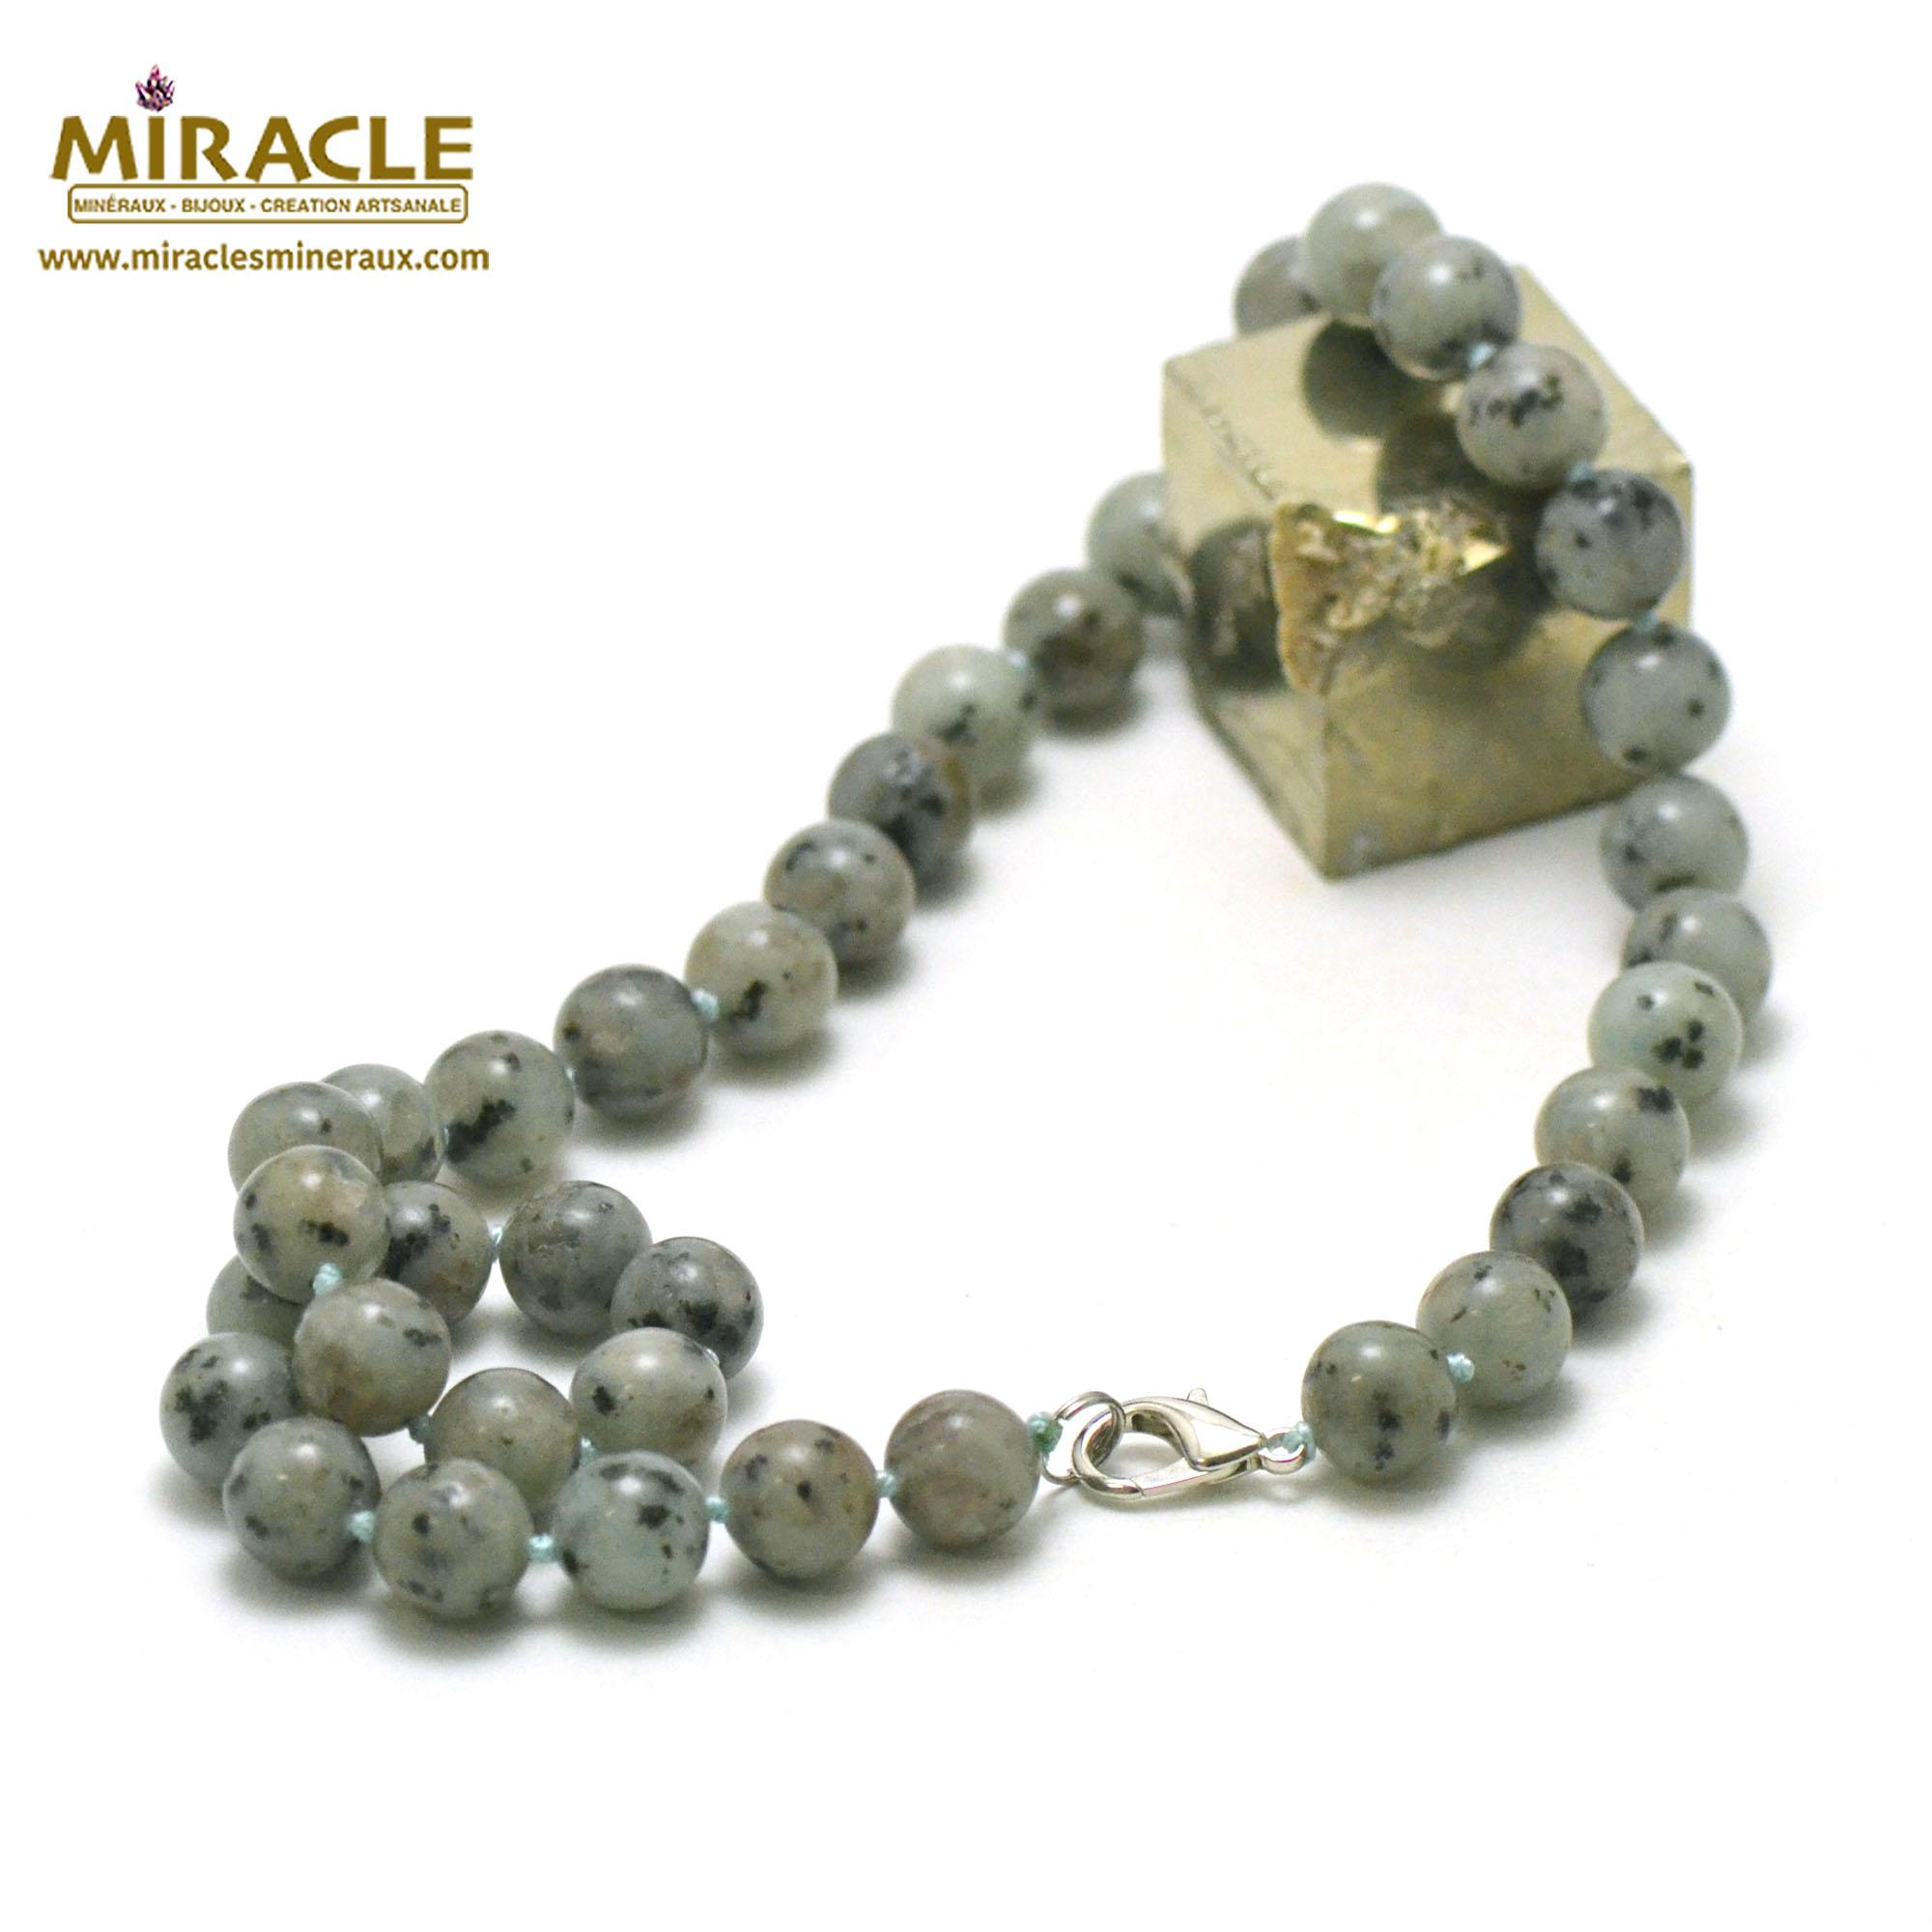 collier Jade néphrite des Andes perle ronde 10 mm